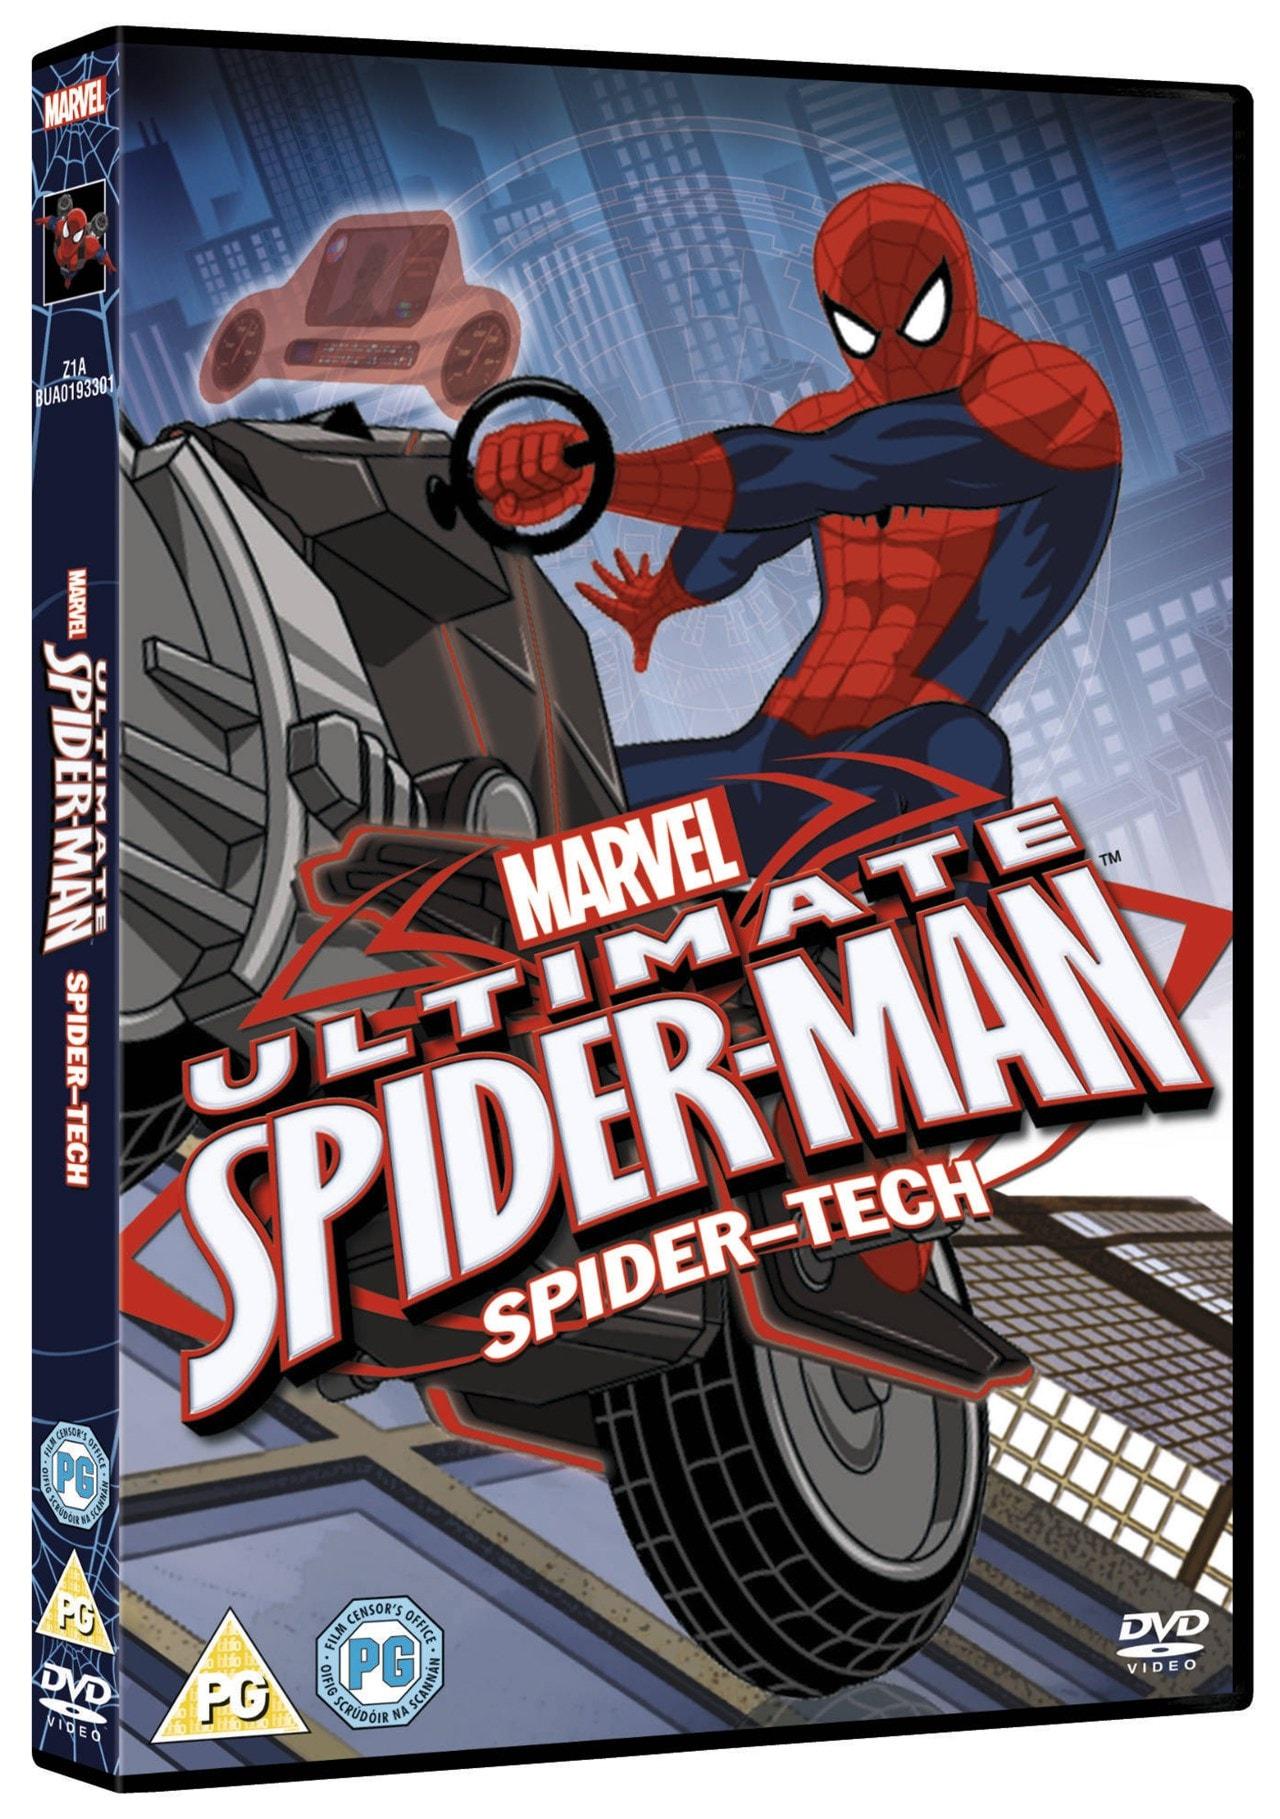 Ultimate Spider-Man: Spider-tech - 2